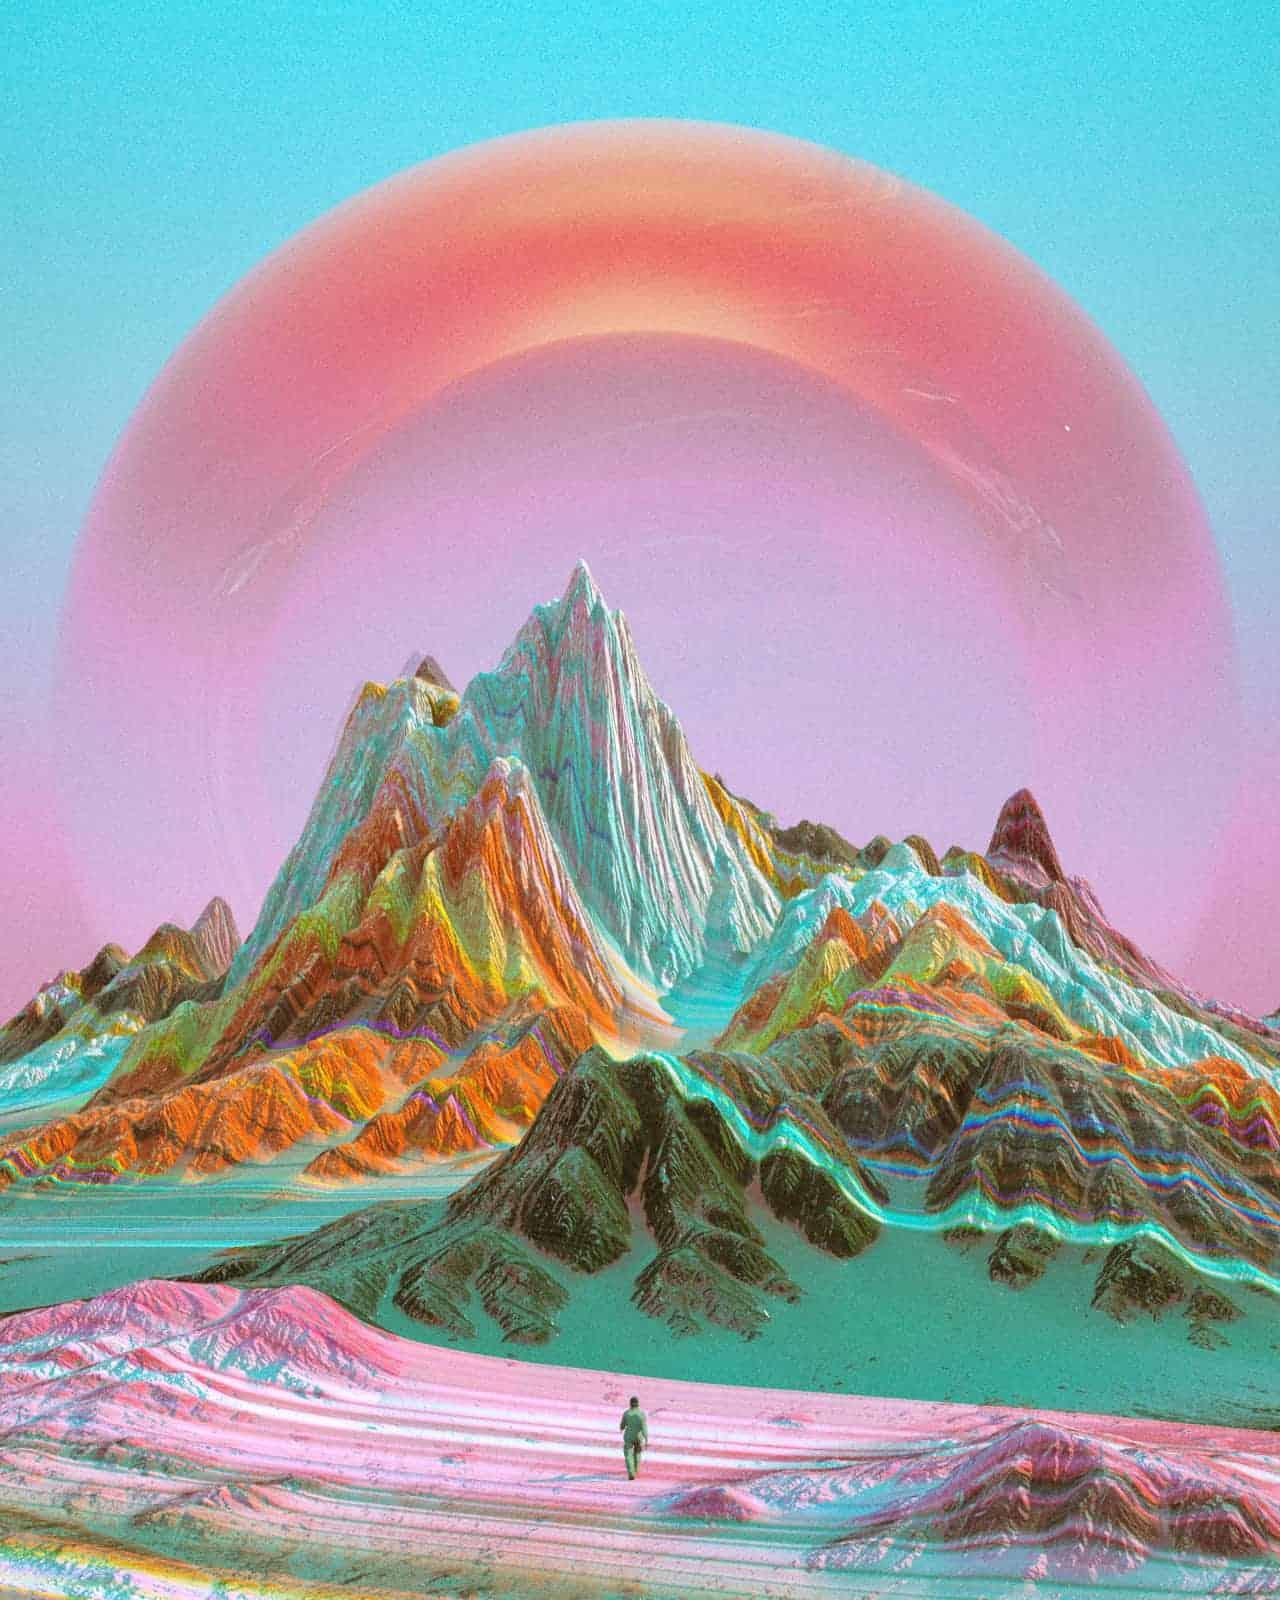 3D C4D   The Imaginative Futuristic and Surreal Worlds of Mike Winkelmann (Beeple) – Vibra ...